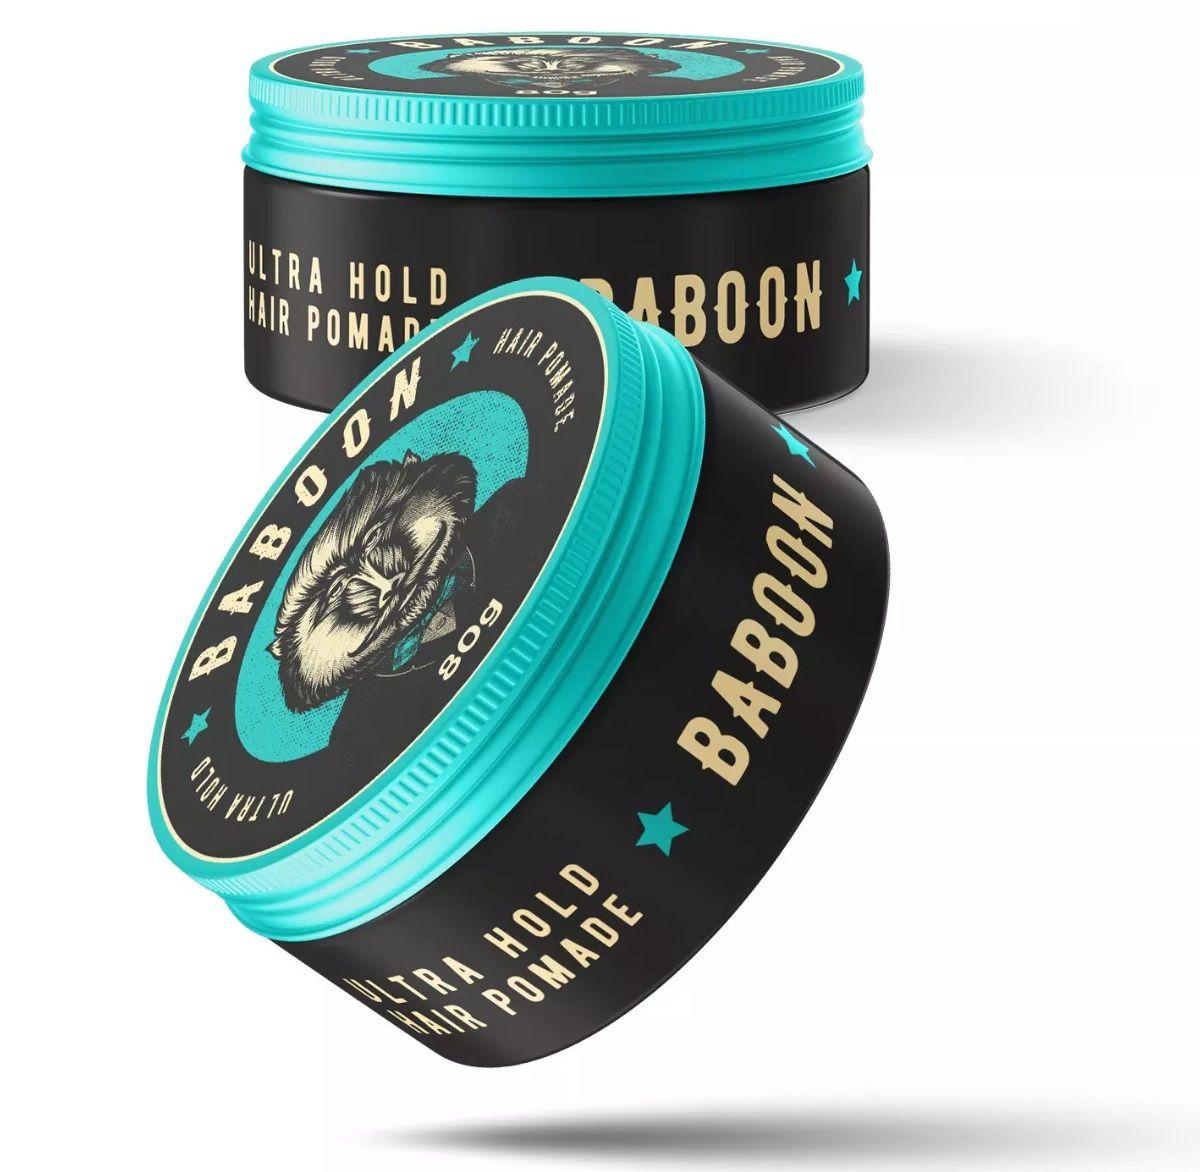 Pomada Modeladora - Ultra Hold Hair Pomade - Baboon